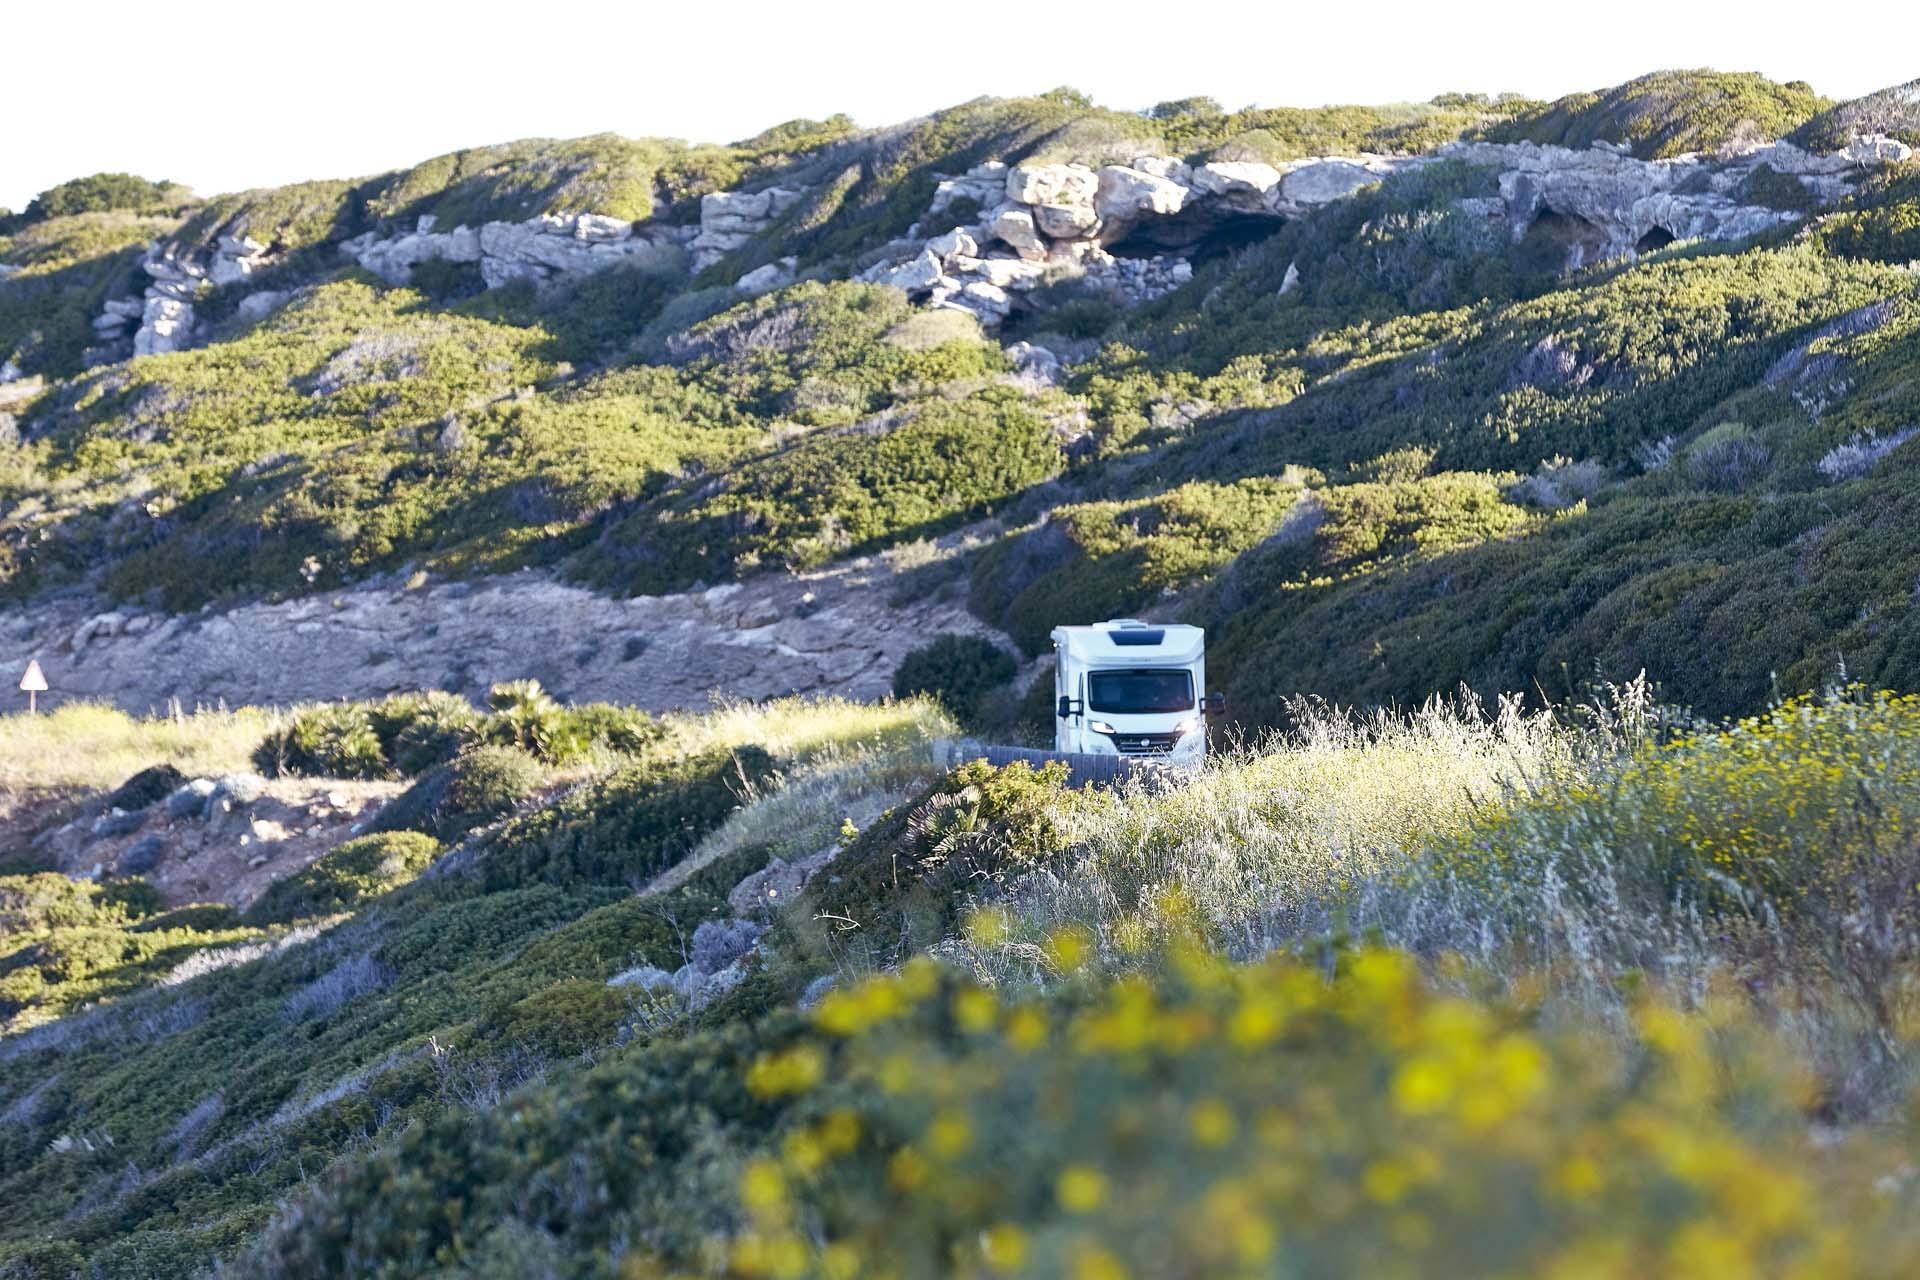 Wohnmobil auf Bergstrasse